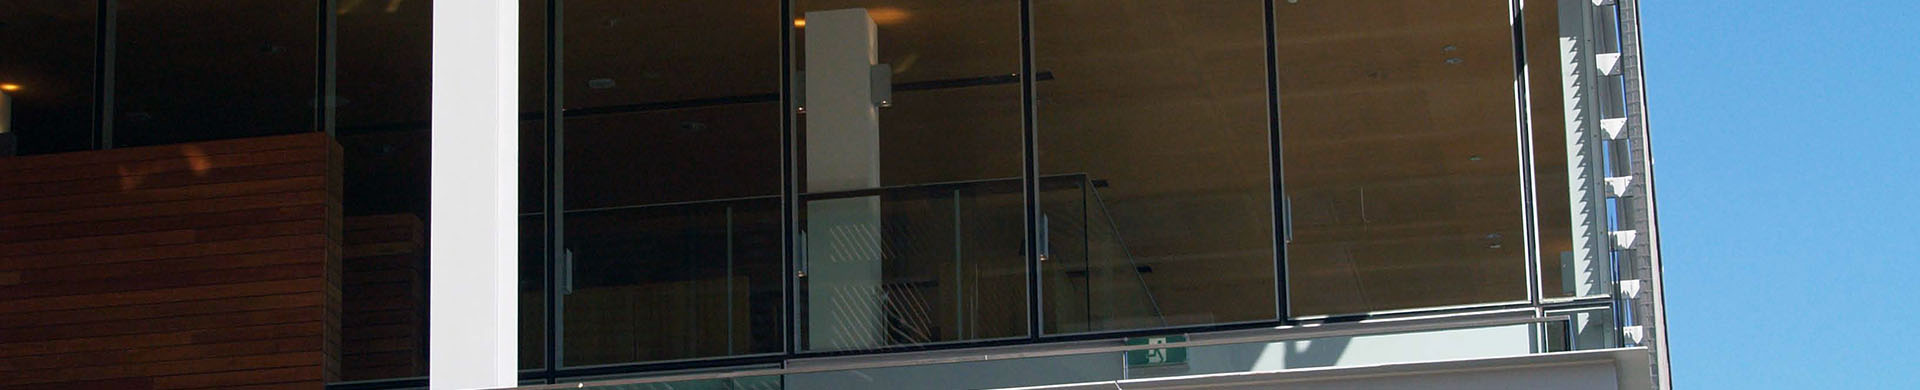 Aluminium Grating Handrails Access Systems